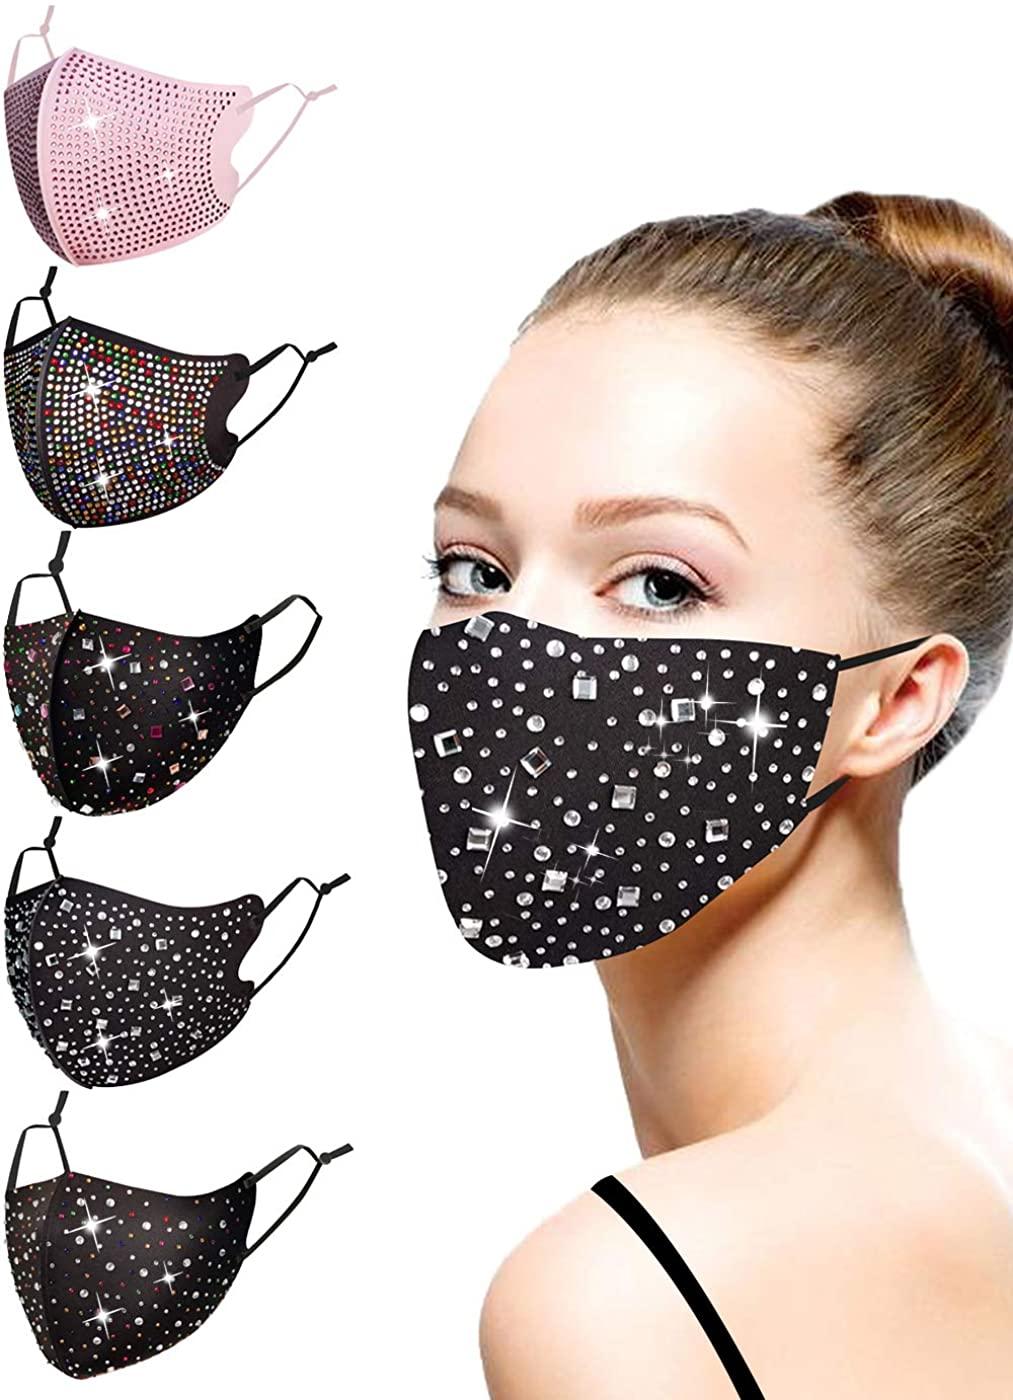 Fashionable Crystal Diamond Christmas Face Coverings for Women Girls, Reuseable Adjustable Rhinestone Mask Halloween